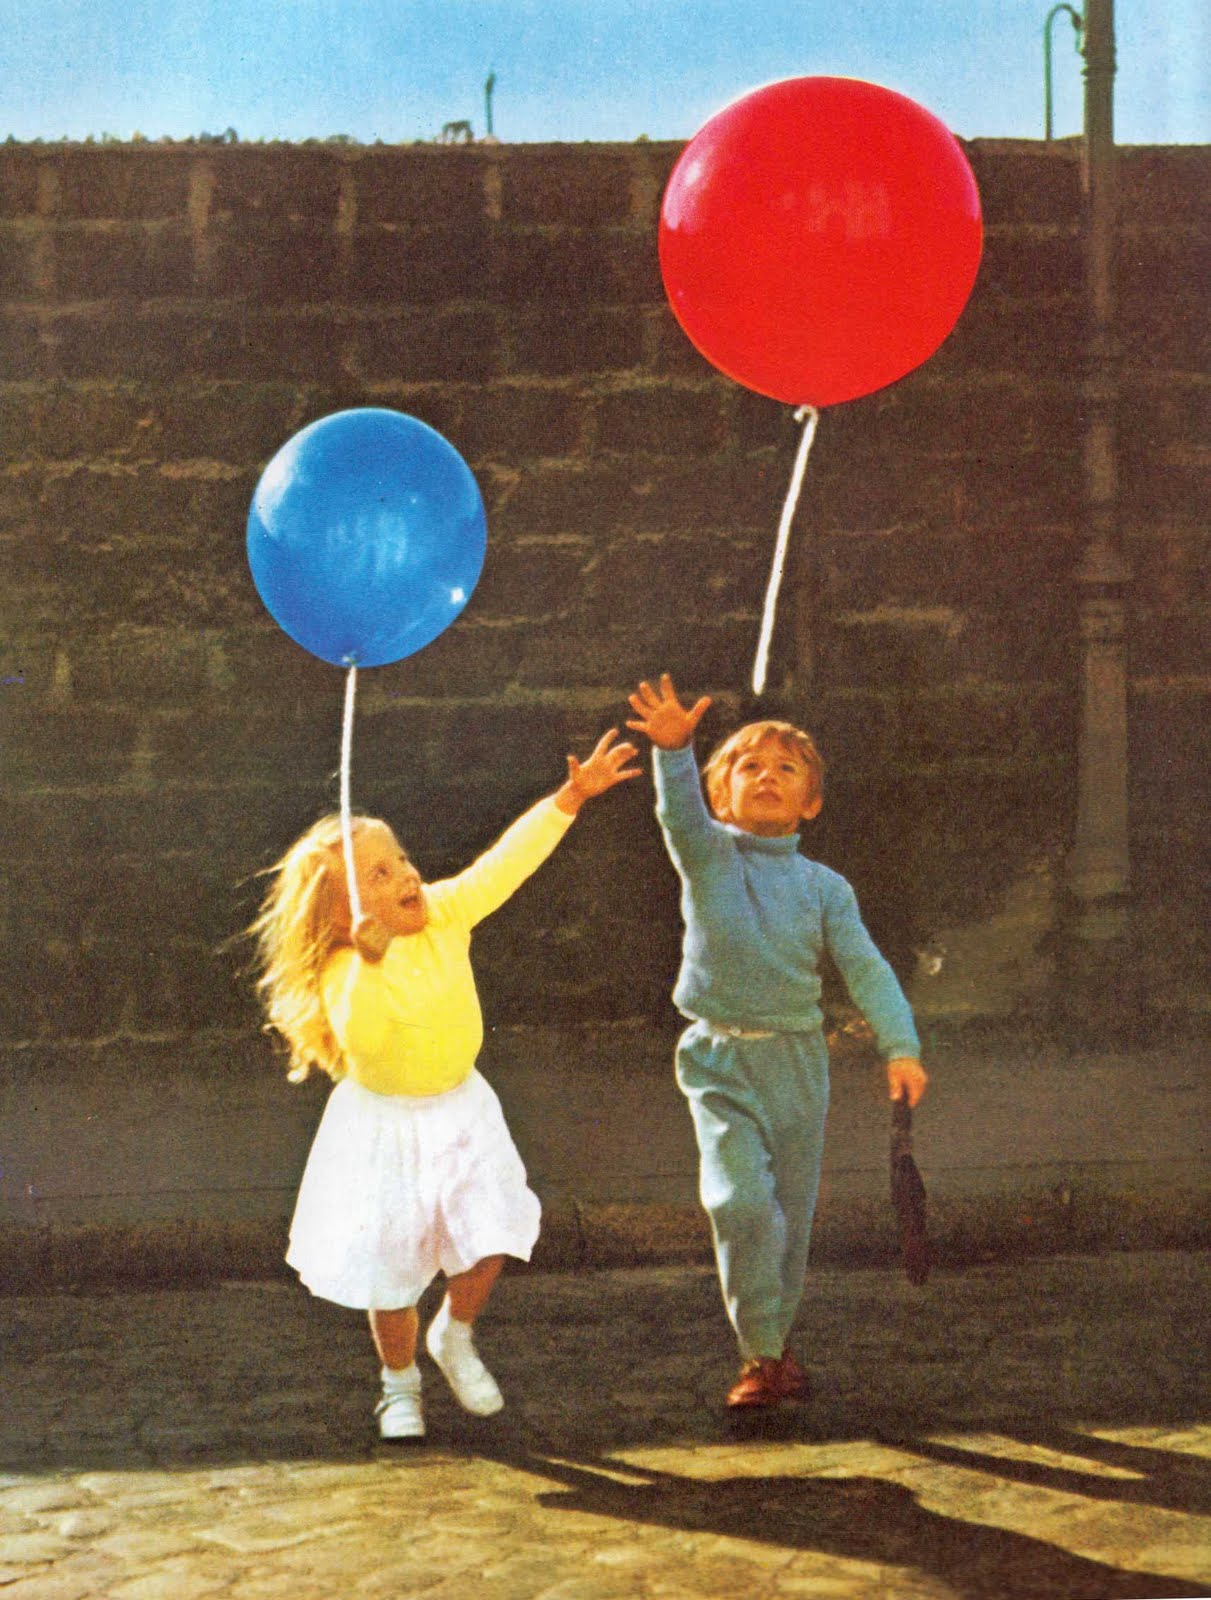 Balloon Stock Photos. Royalty Free Balloon Images